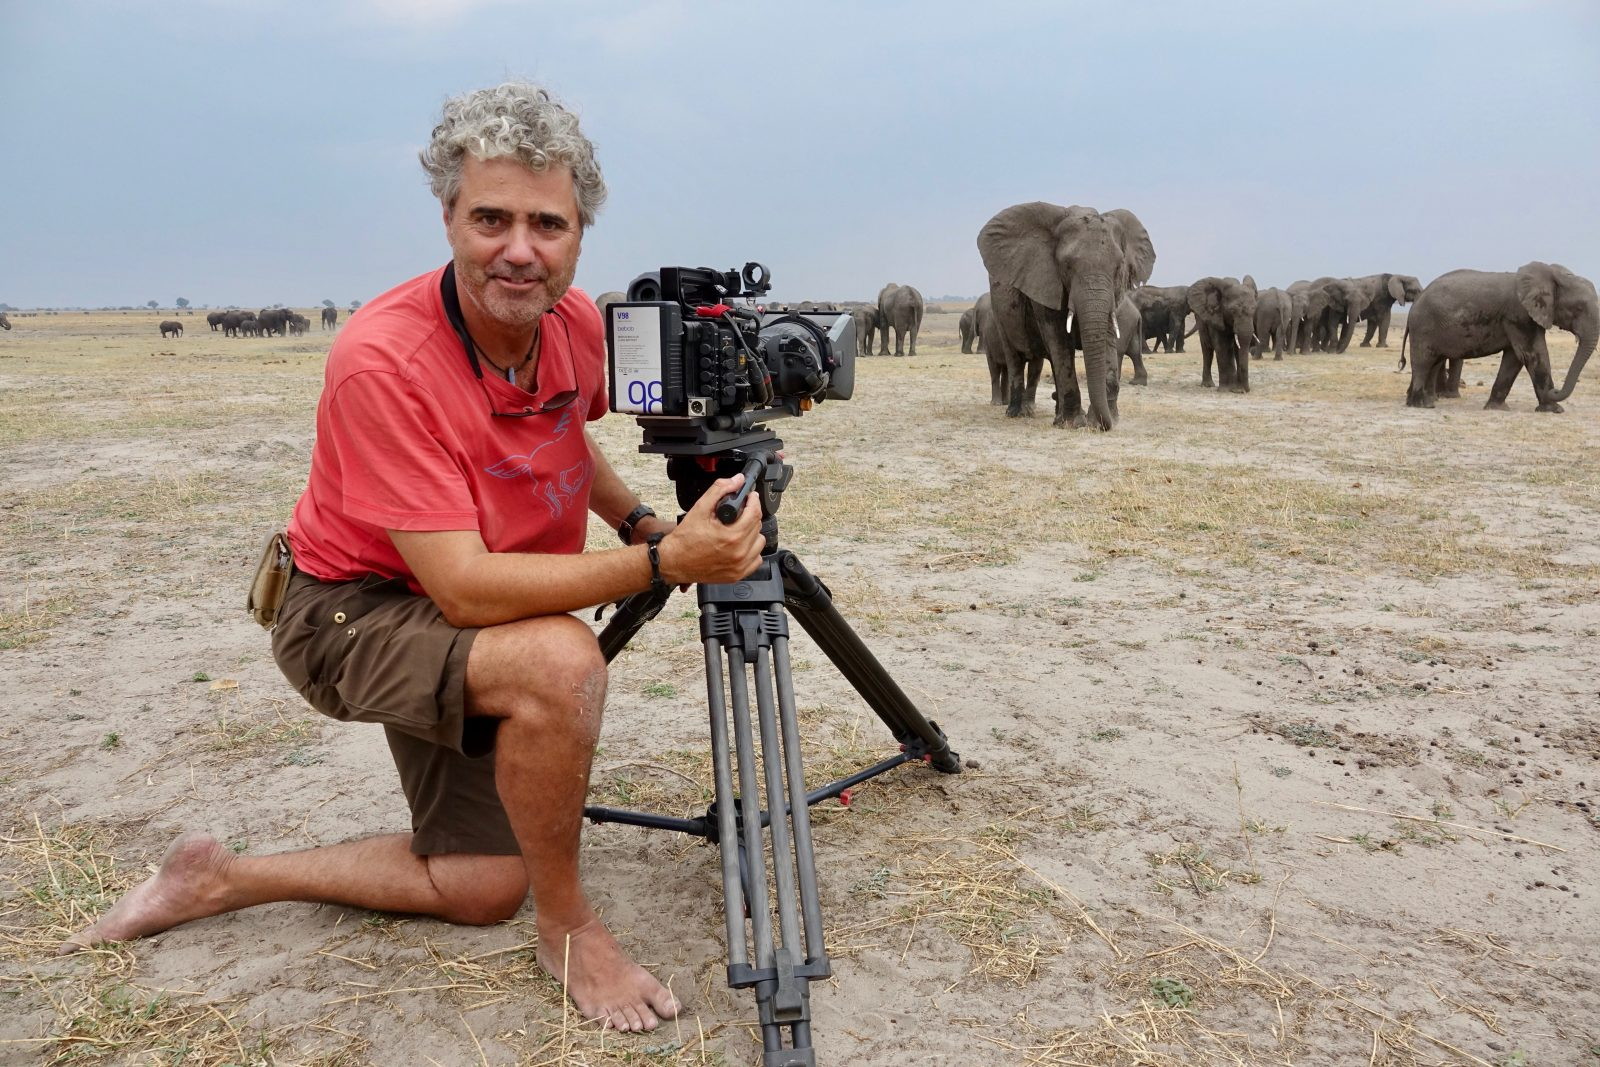 naturfilmer-jens-westphalen-elefanten-nah-dran